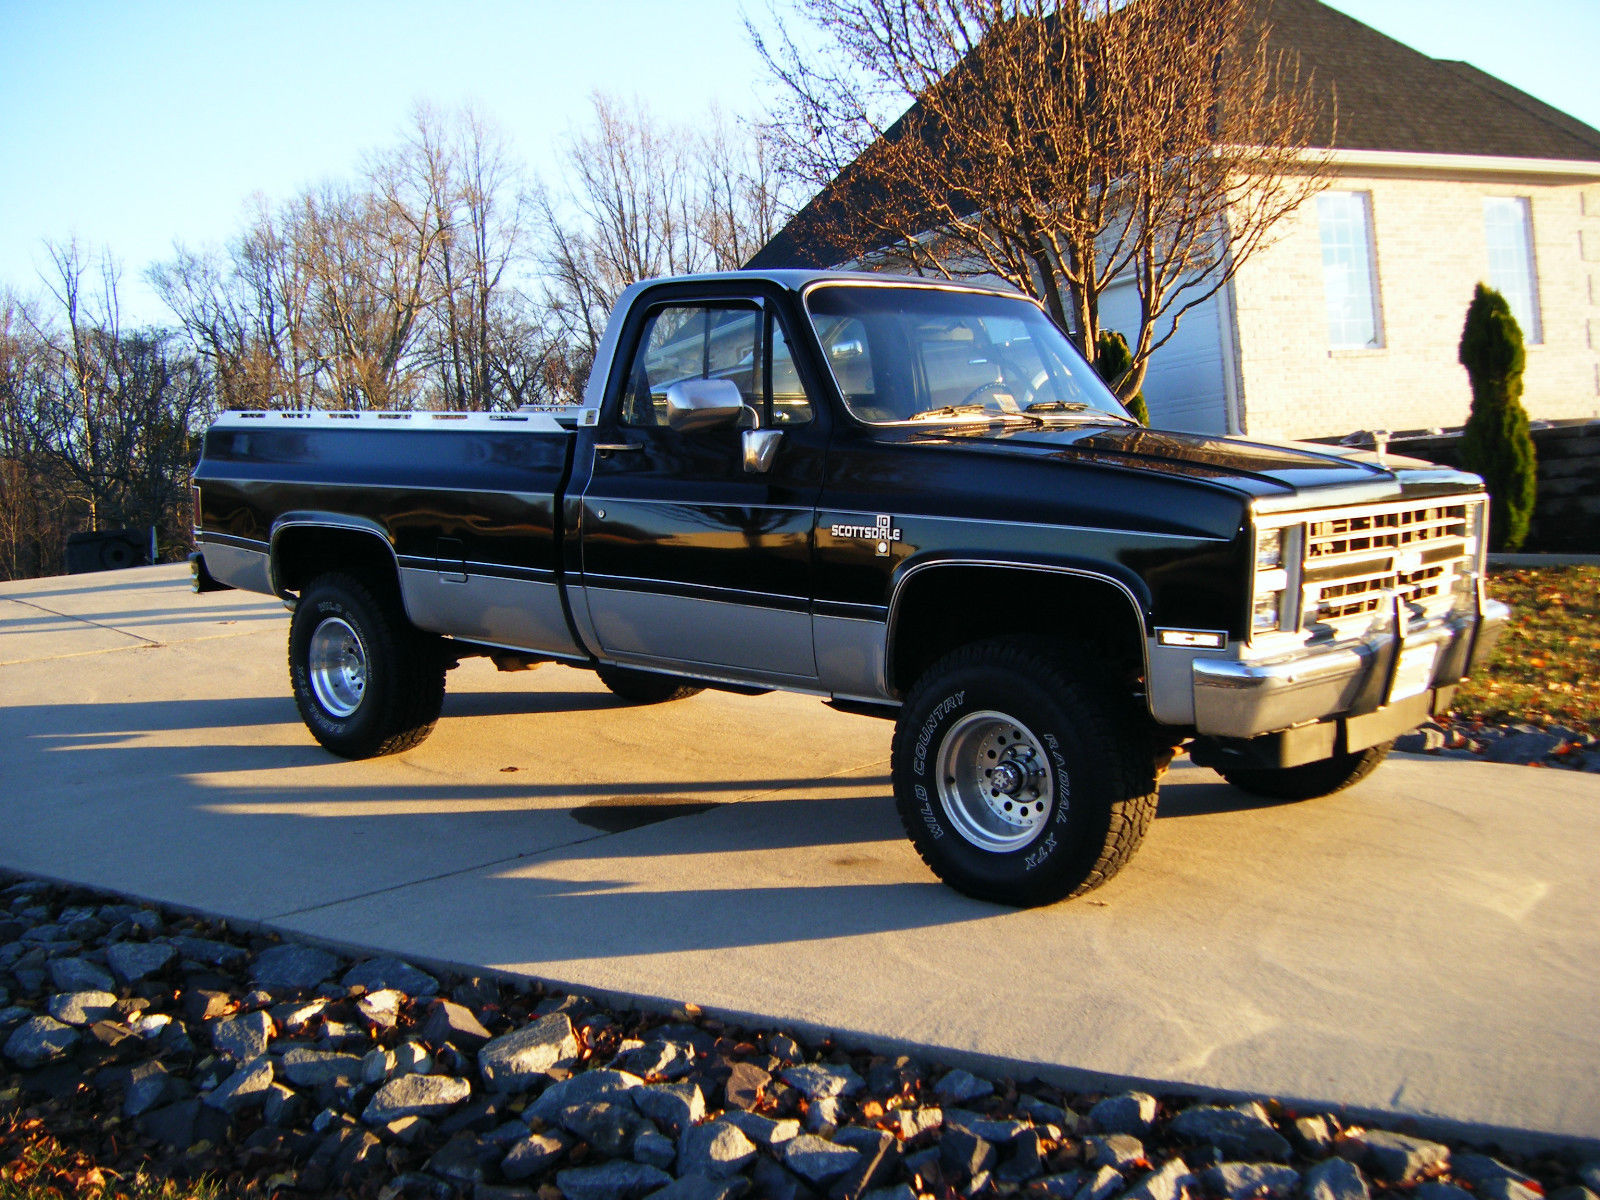 1985 Chevrolet Scottsdale 4X4 Truck - Classic Chevrolet Other ...